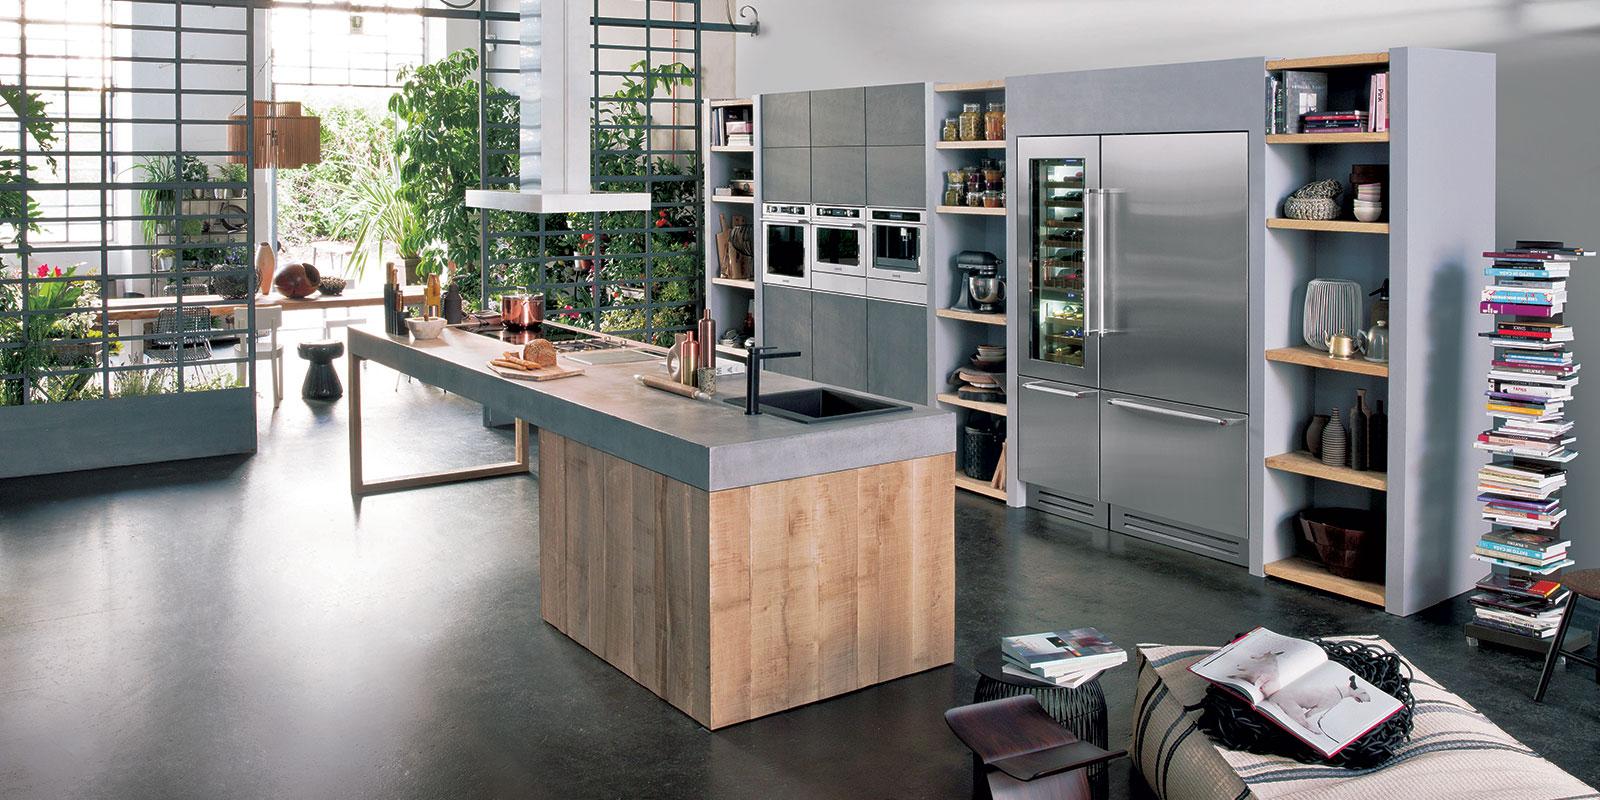 Premium keukenproducten, KitchenAid, keukenmerk